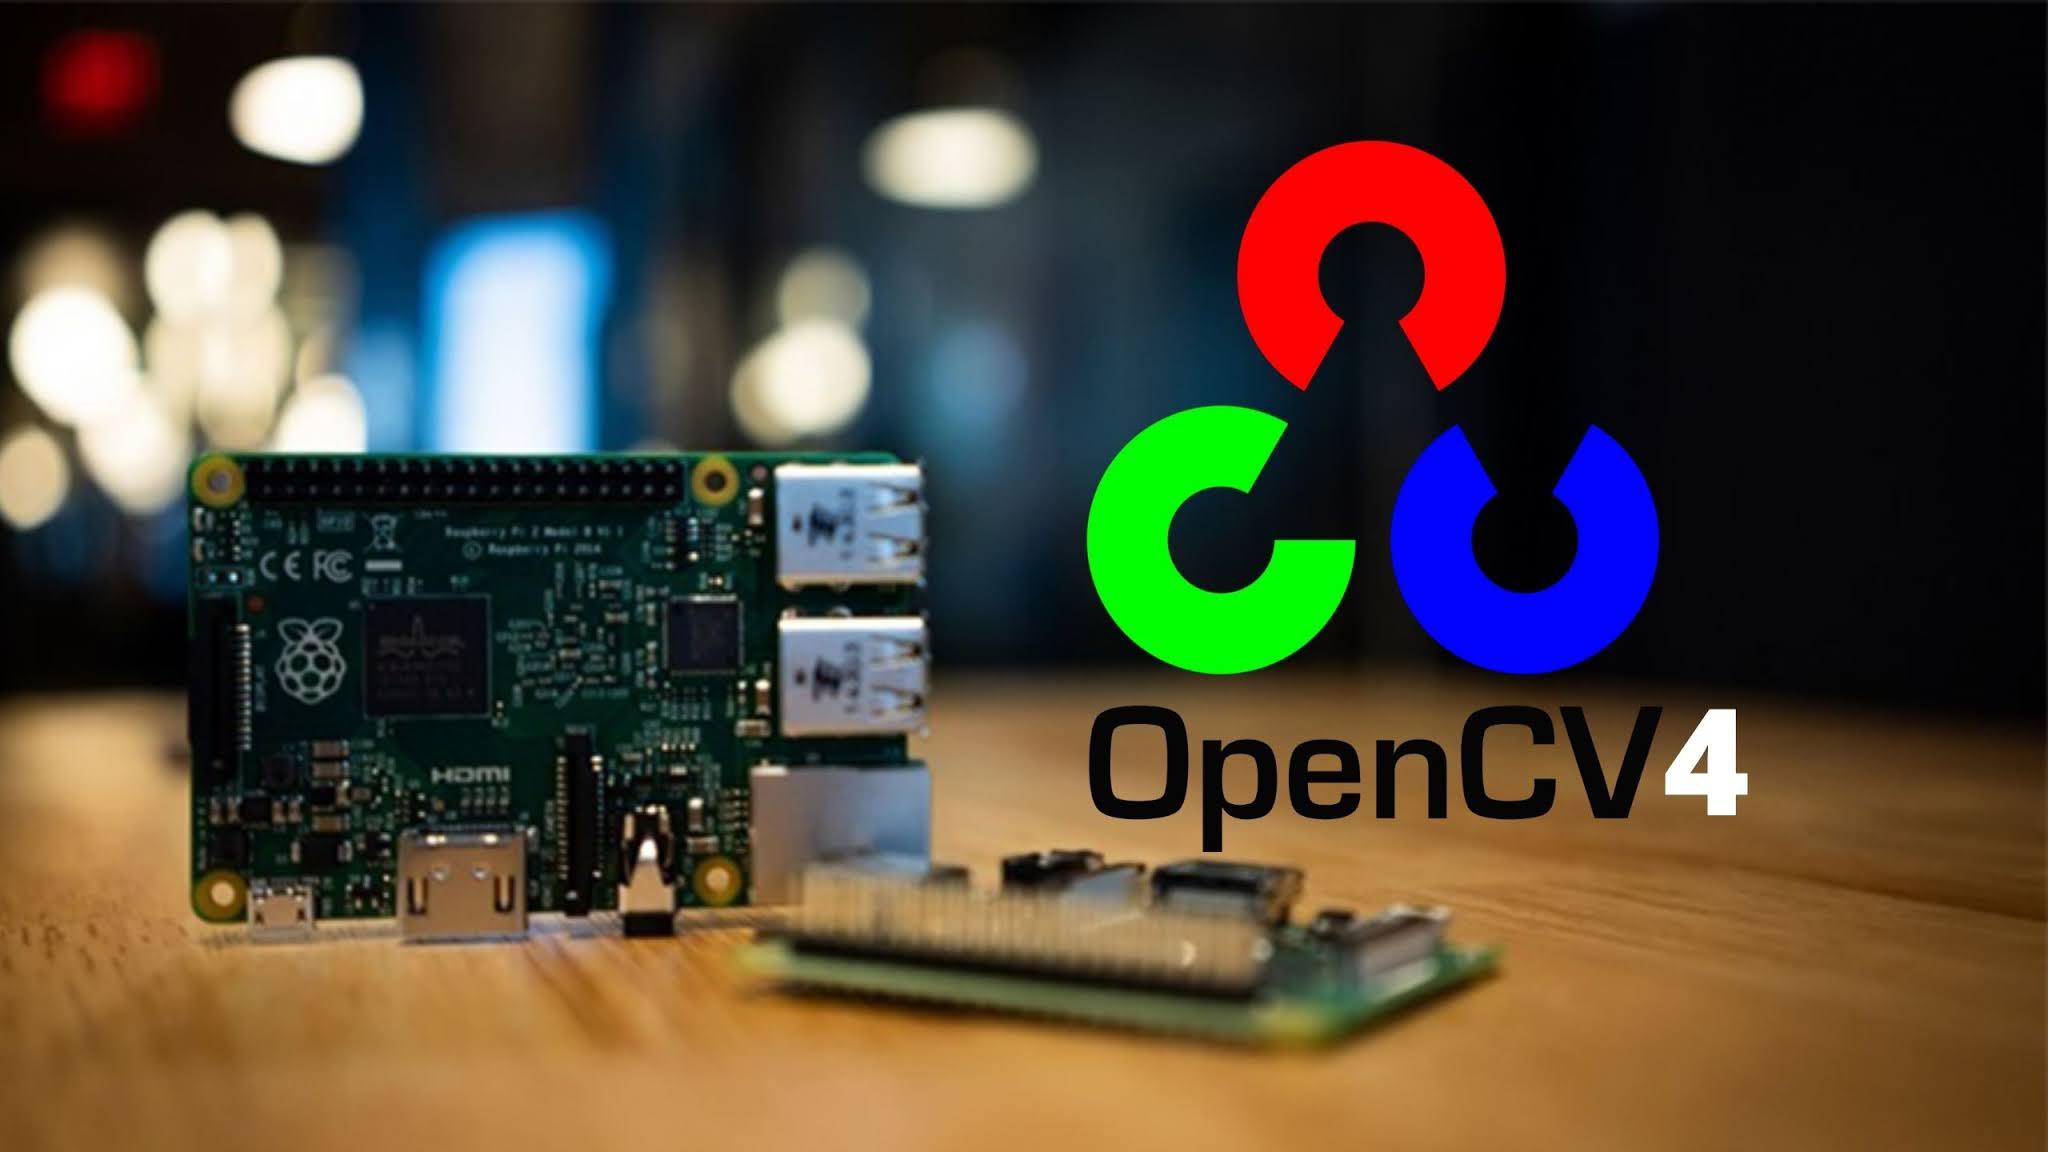 Install OpenCV4 on Raspberry pi 4